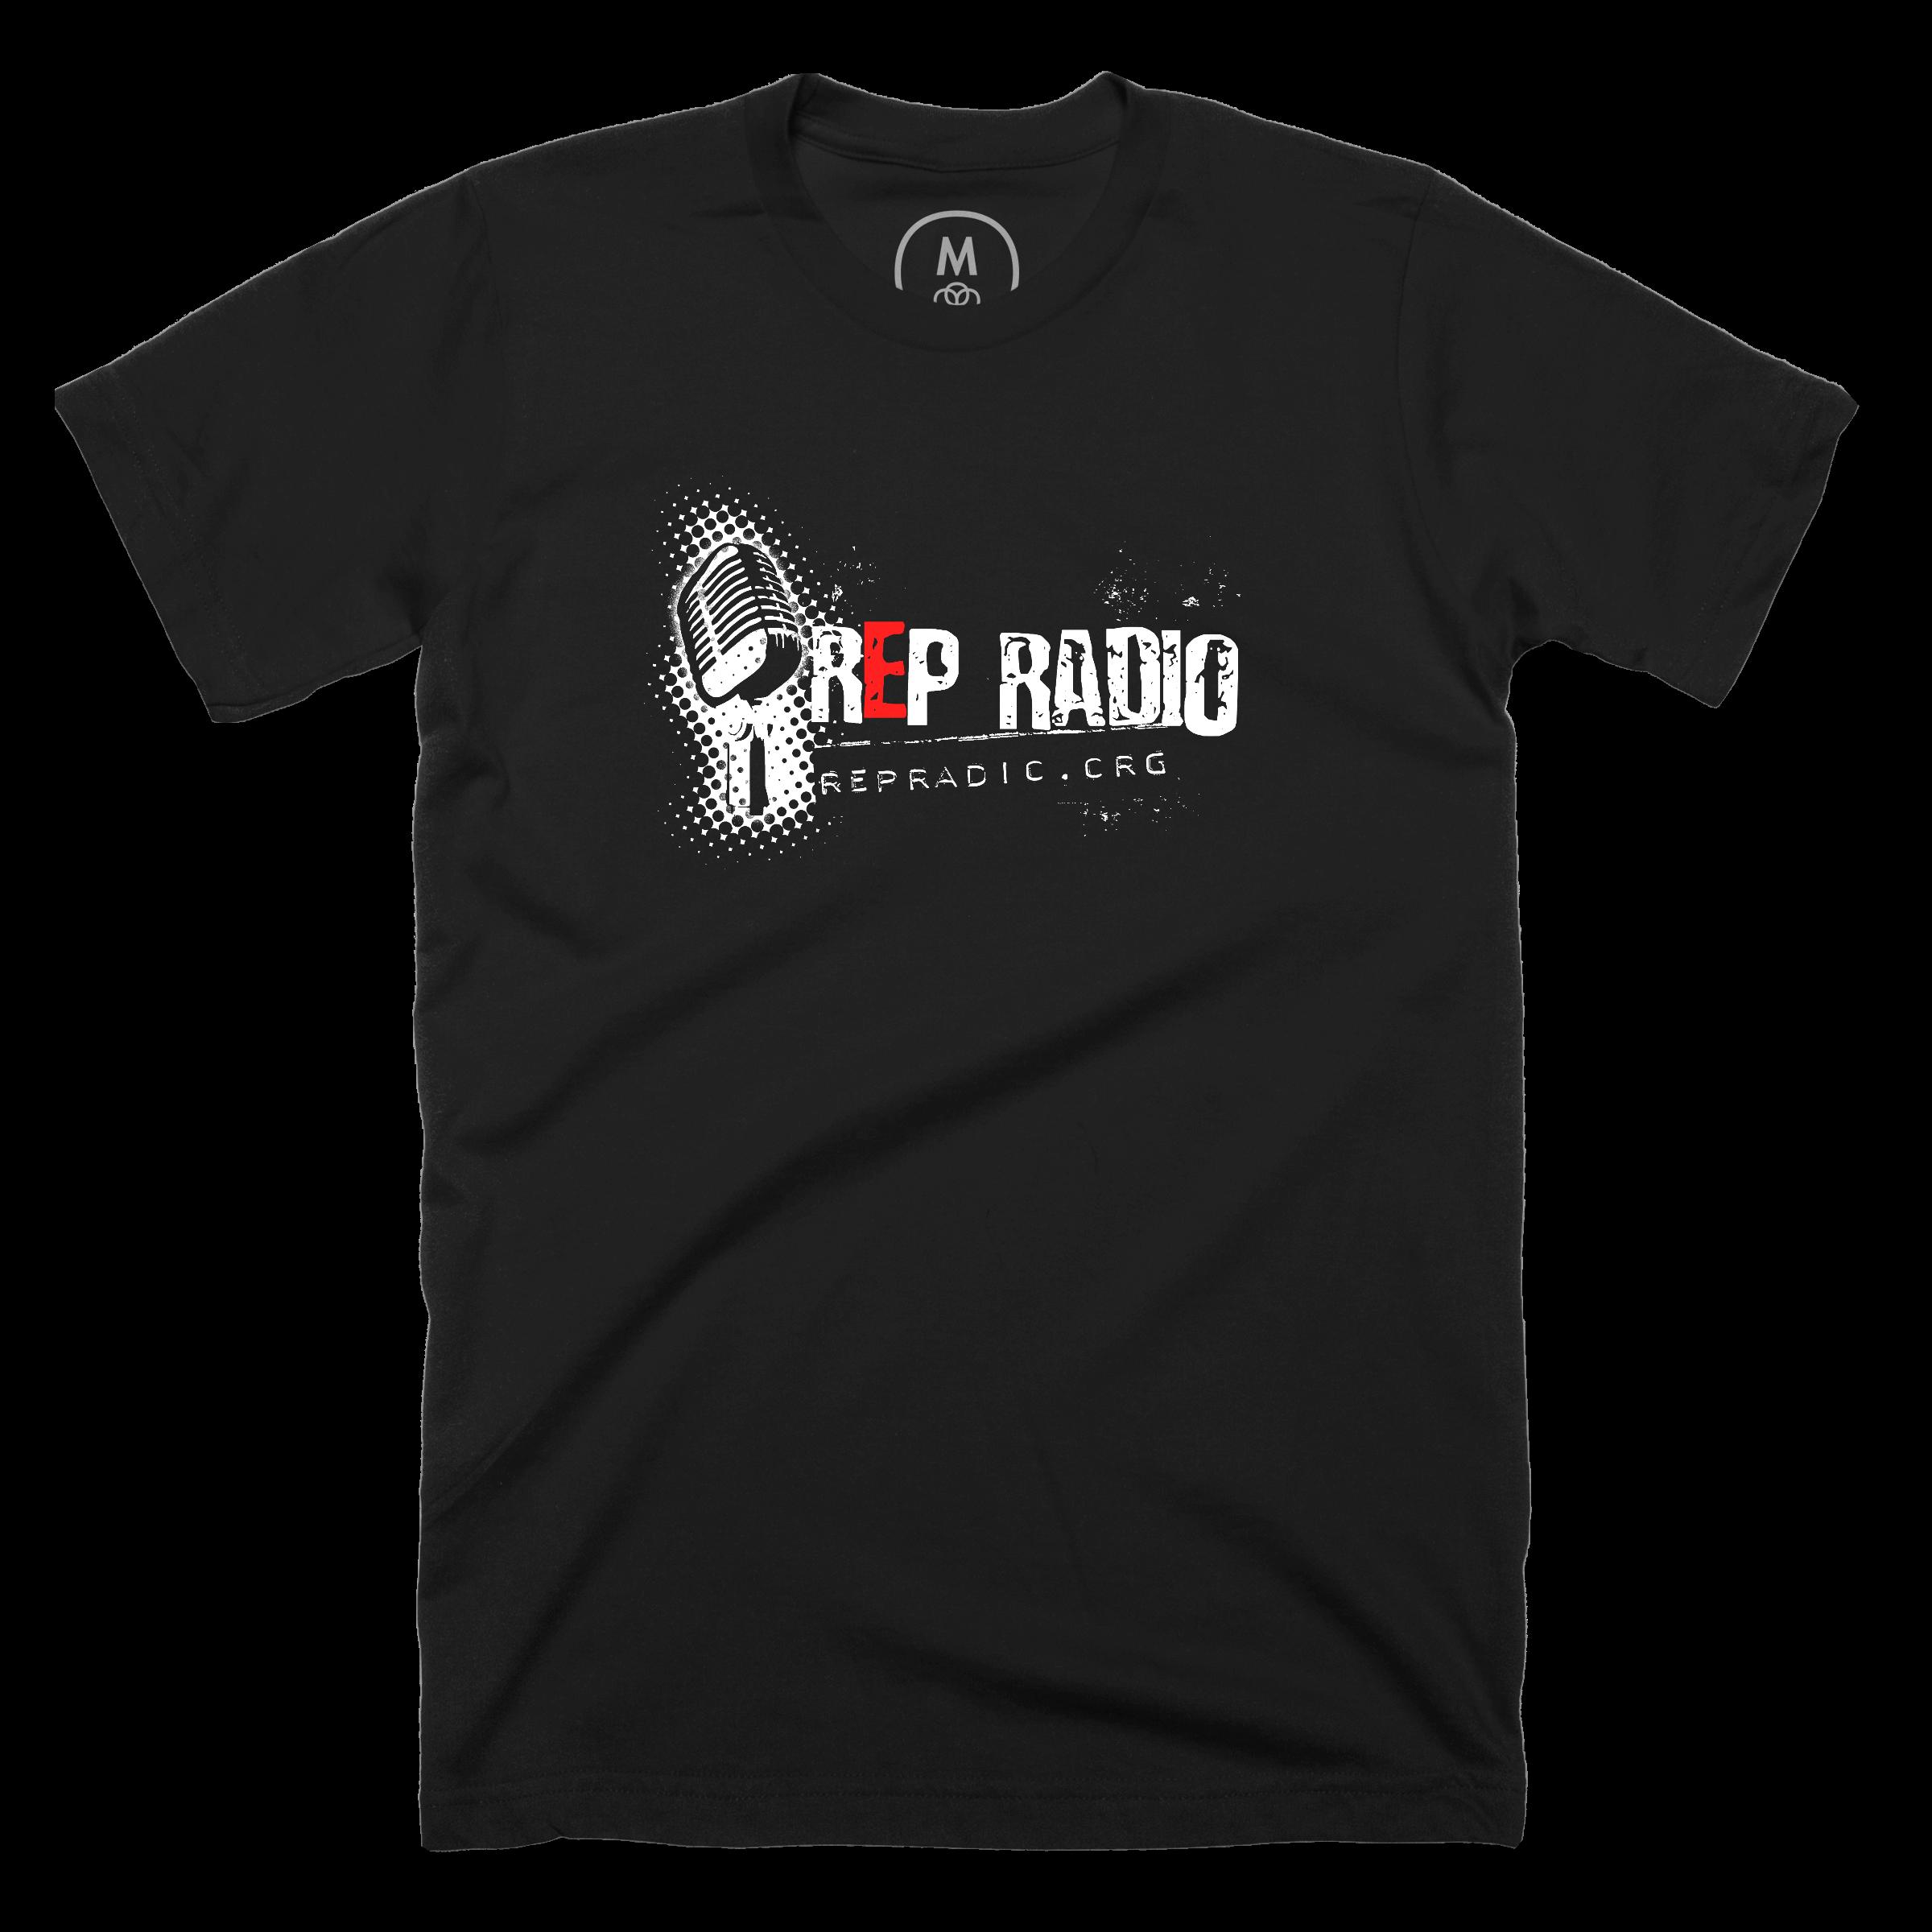 Rep Radio_Original Logo